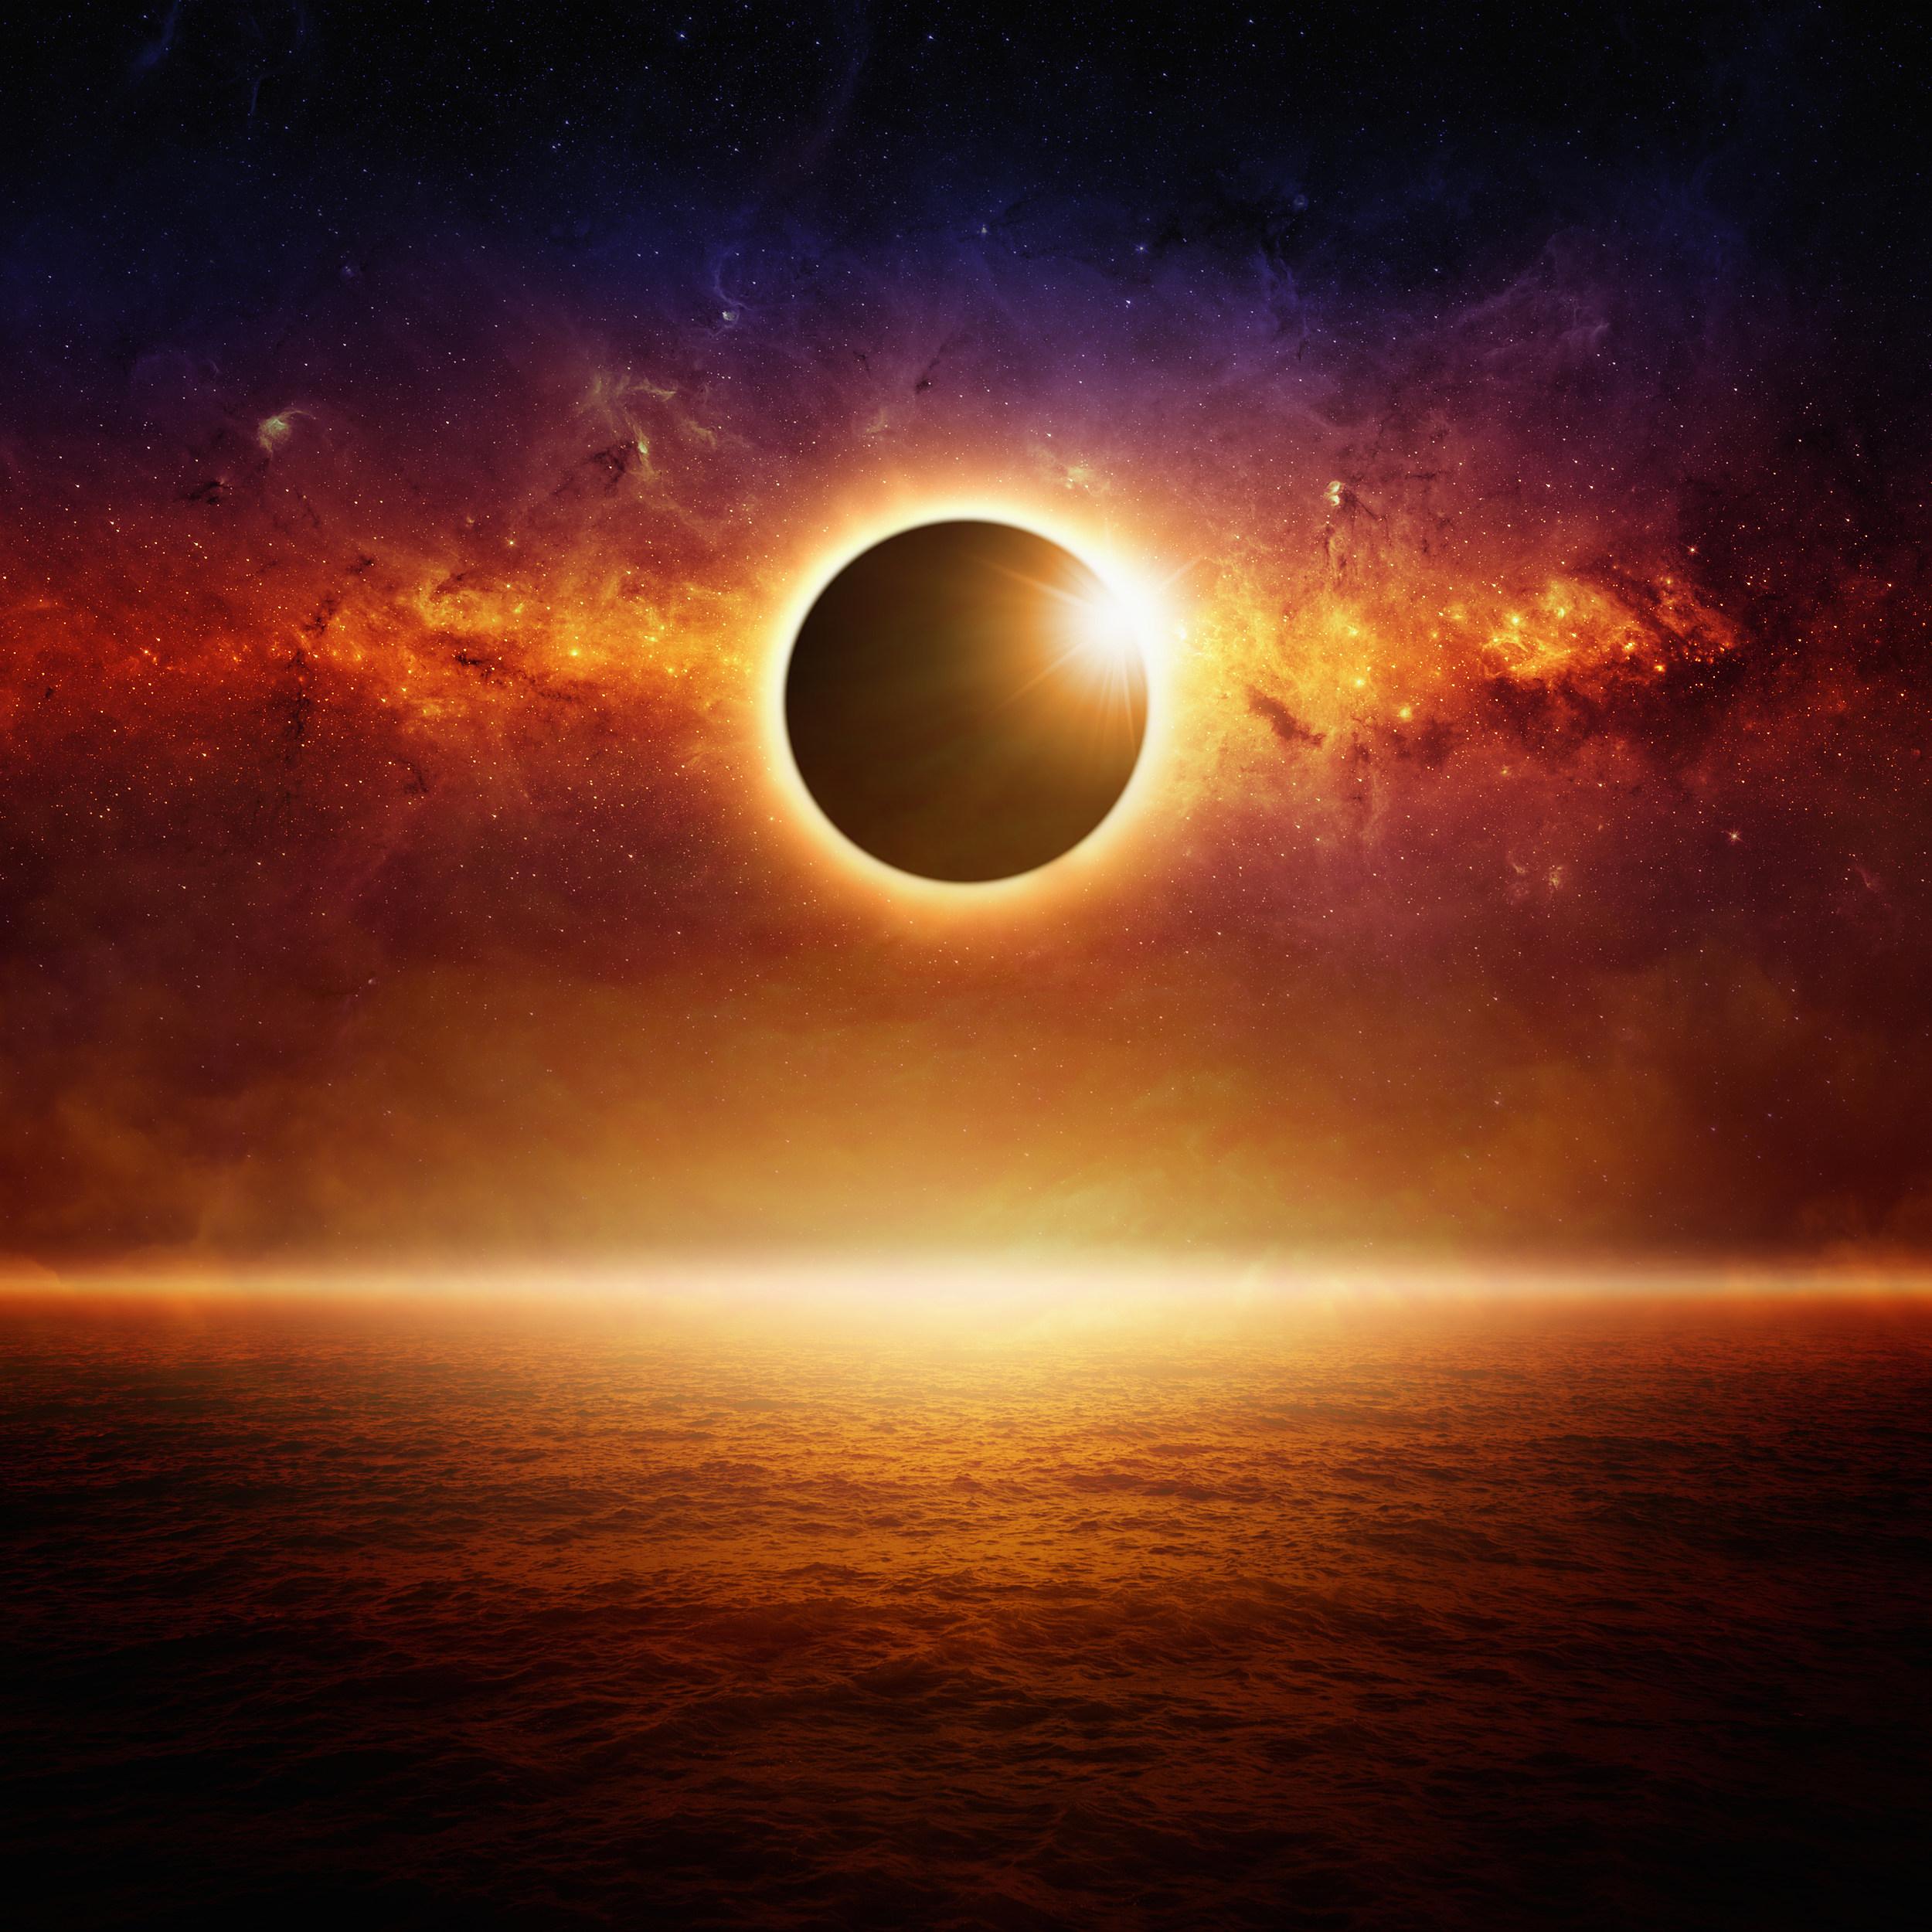 Full sun eclipce